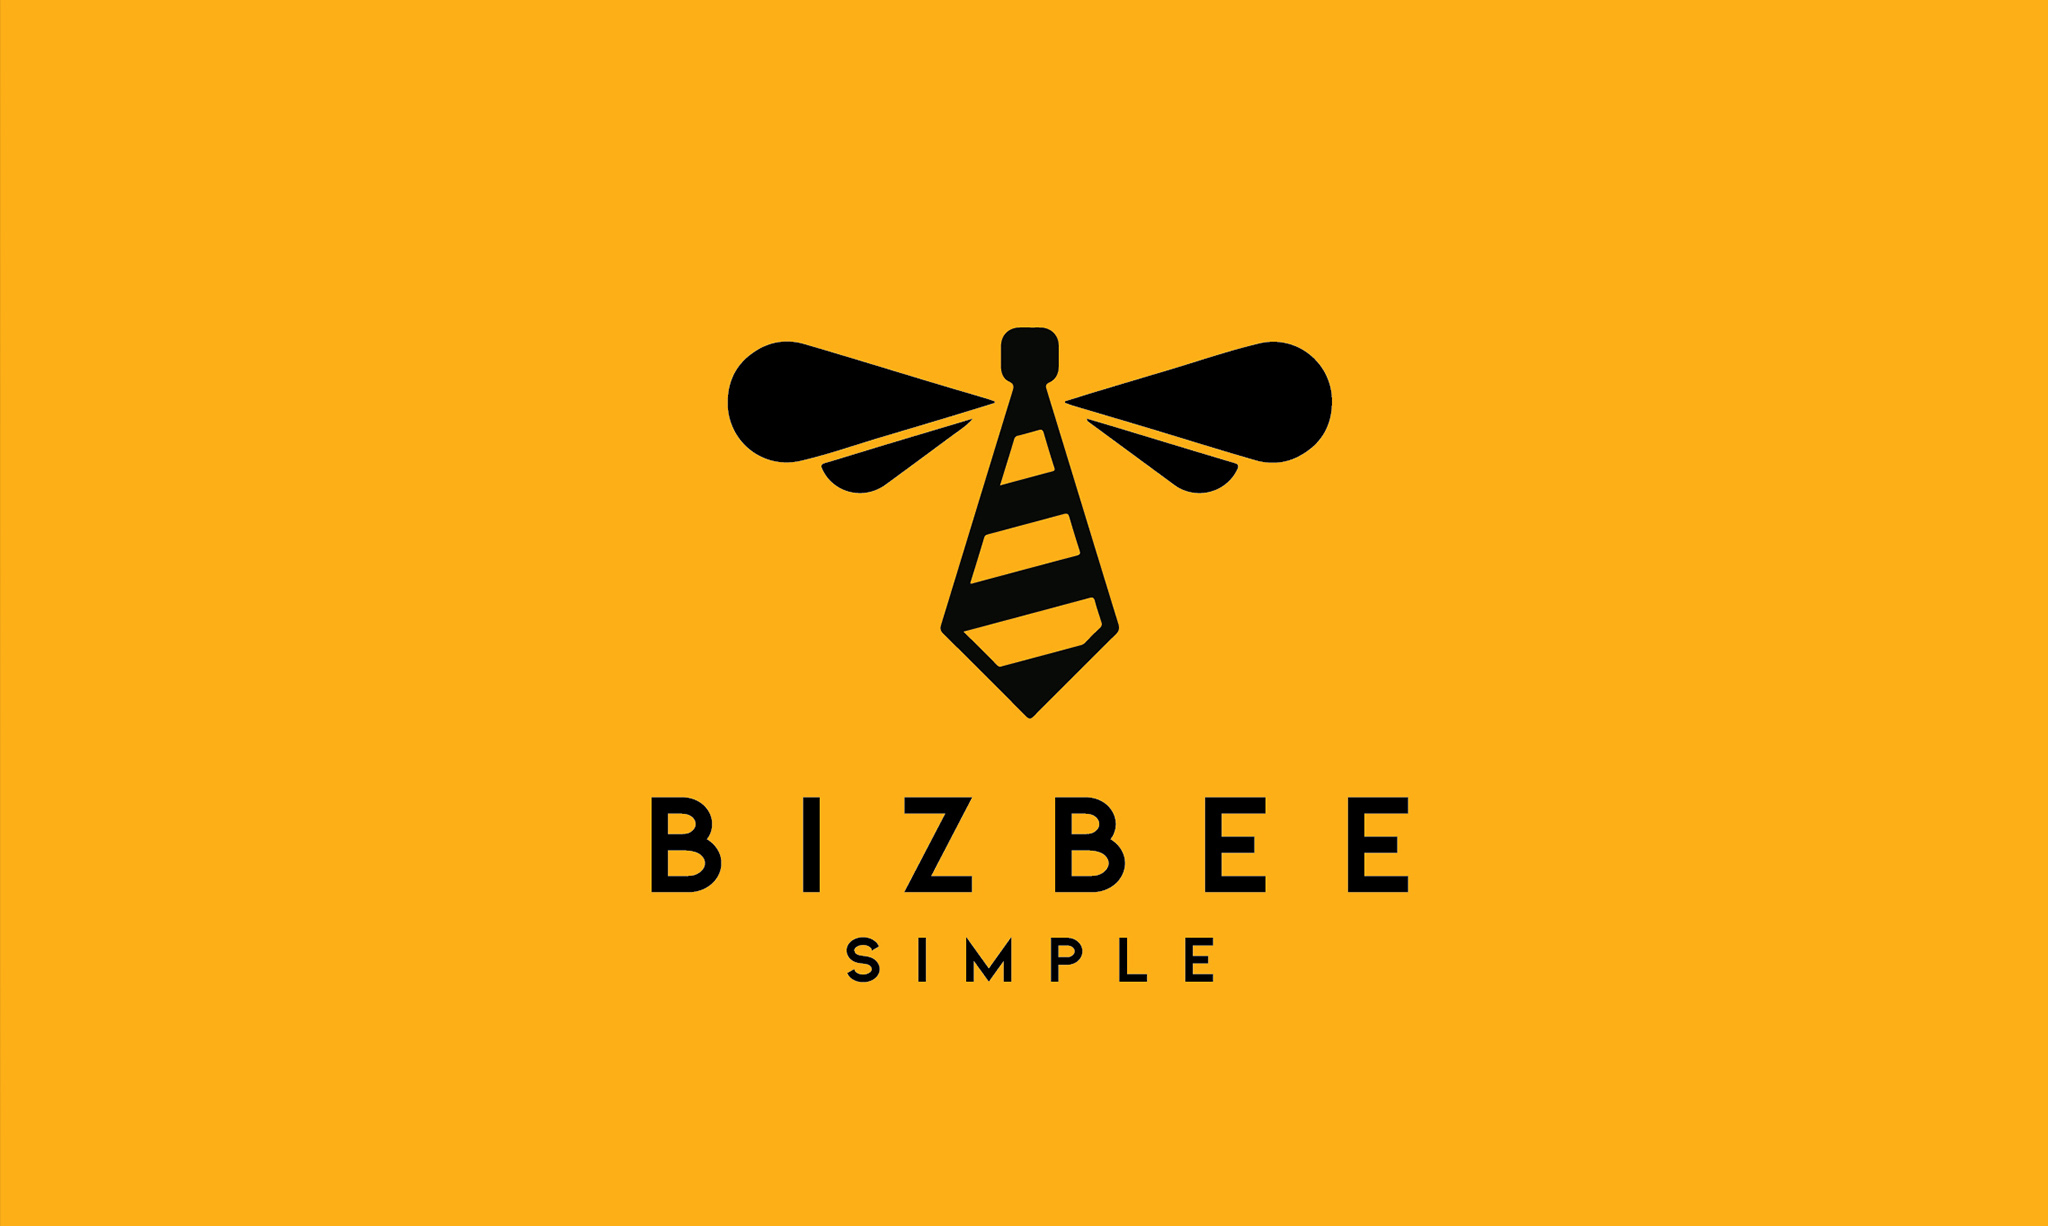 Design Unique Minimal Logo For Your Business